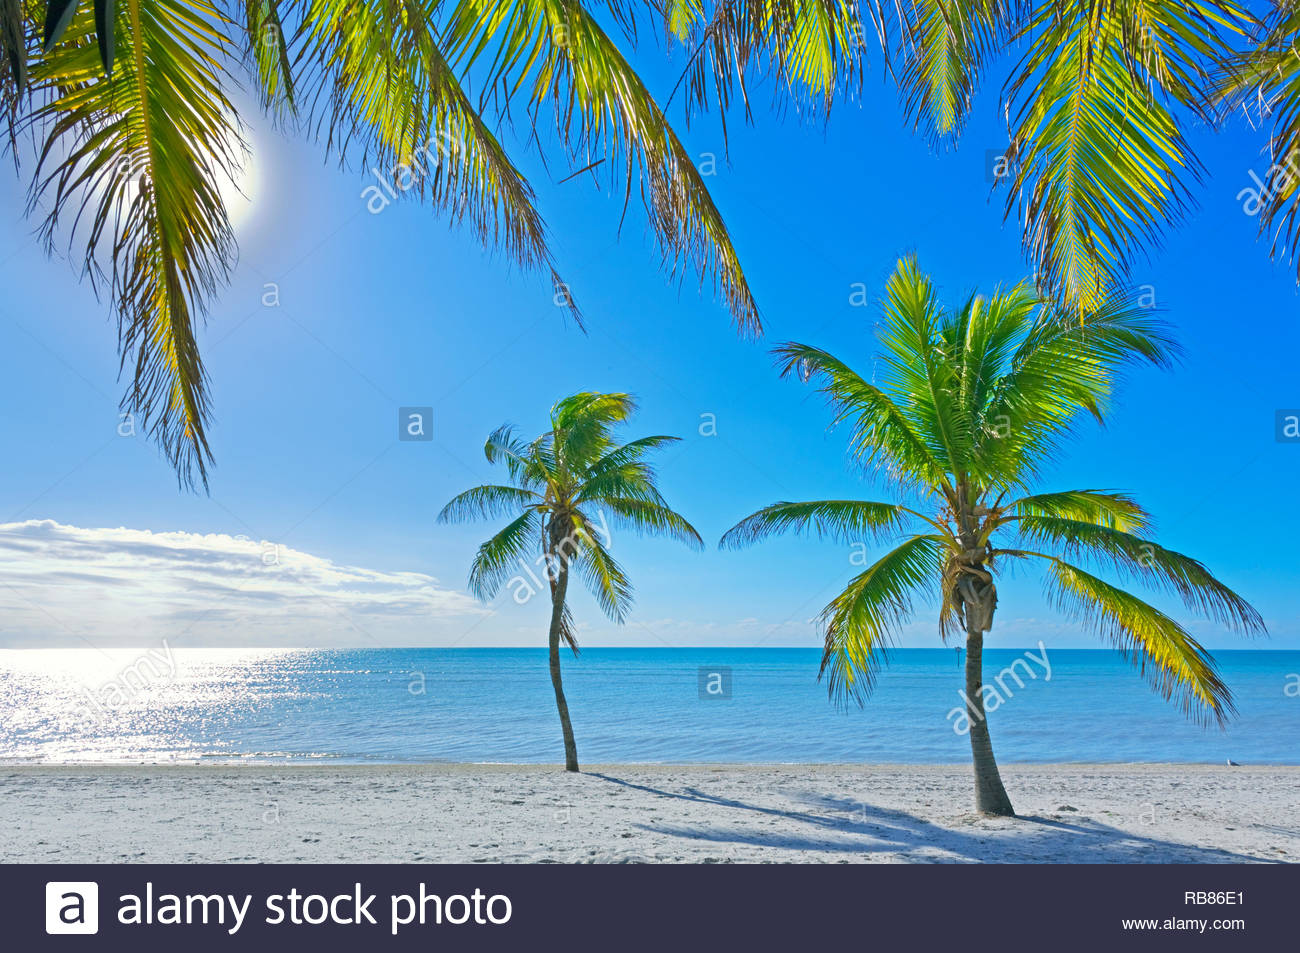 Tropical beach, Key West, Florida, USA - Stock Image